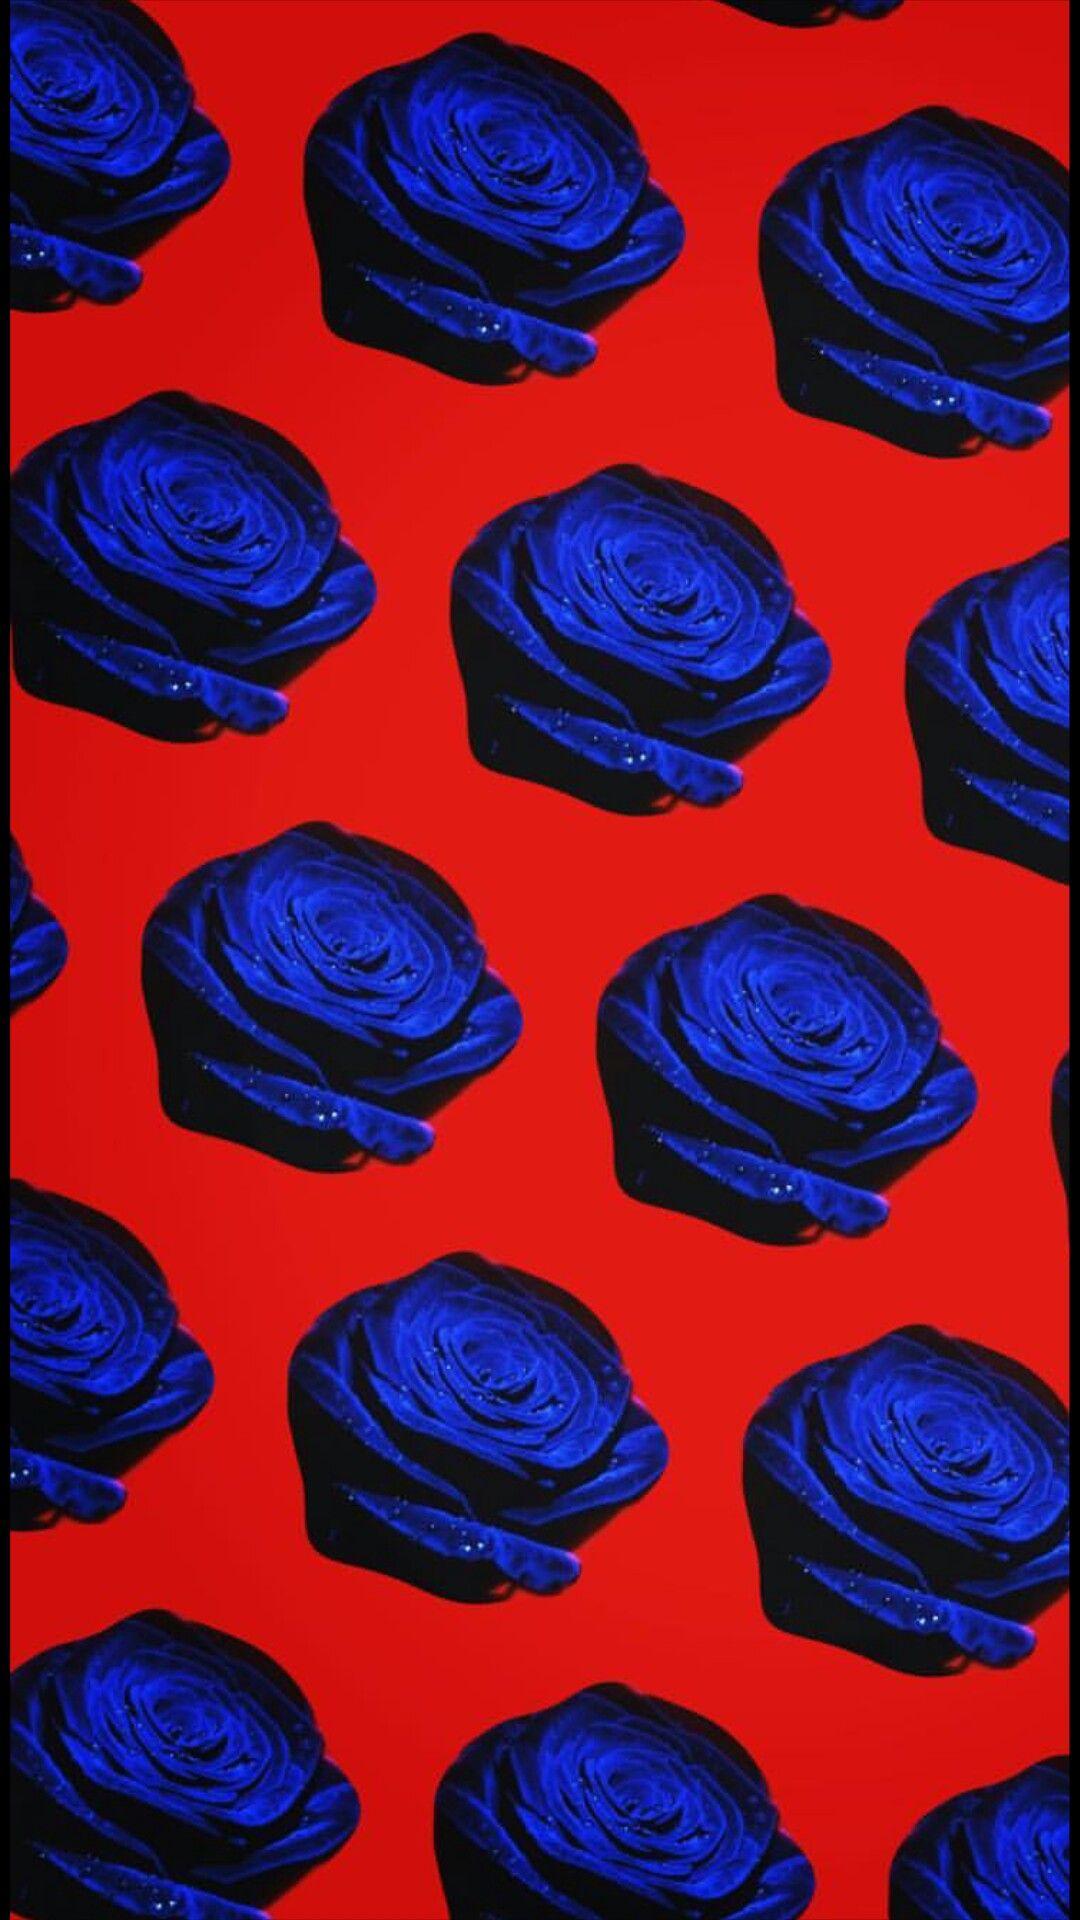 Song Minho Blue Rose Wallpaper